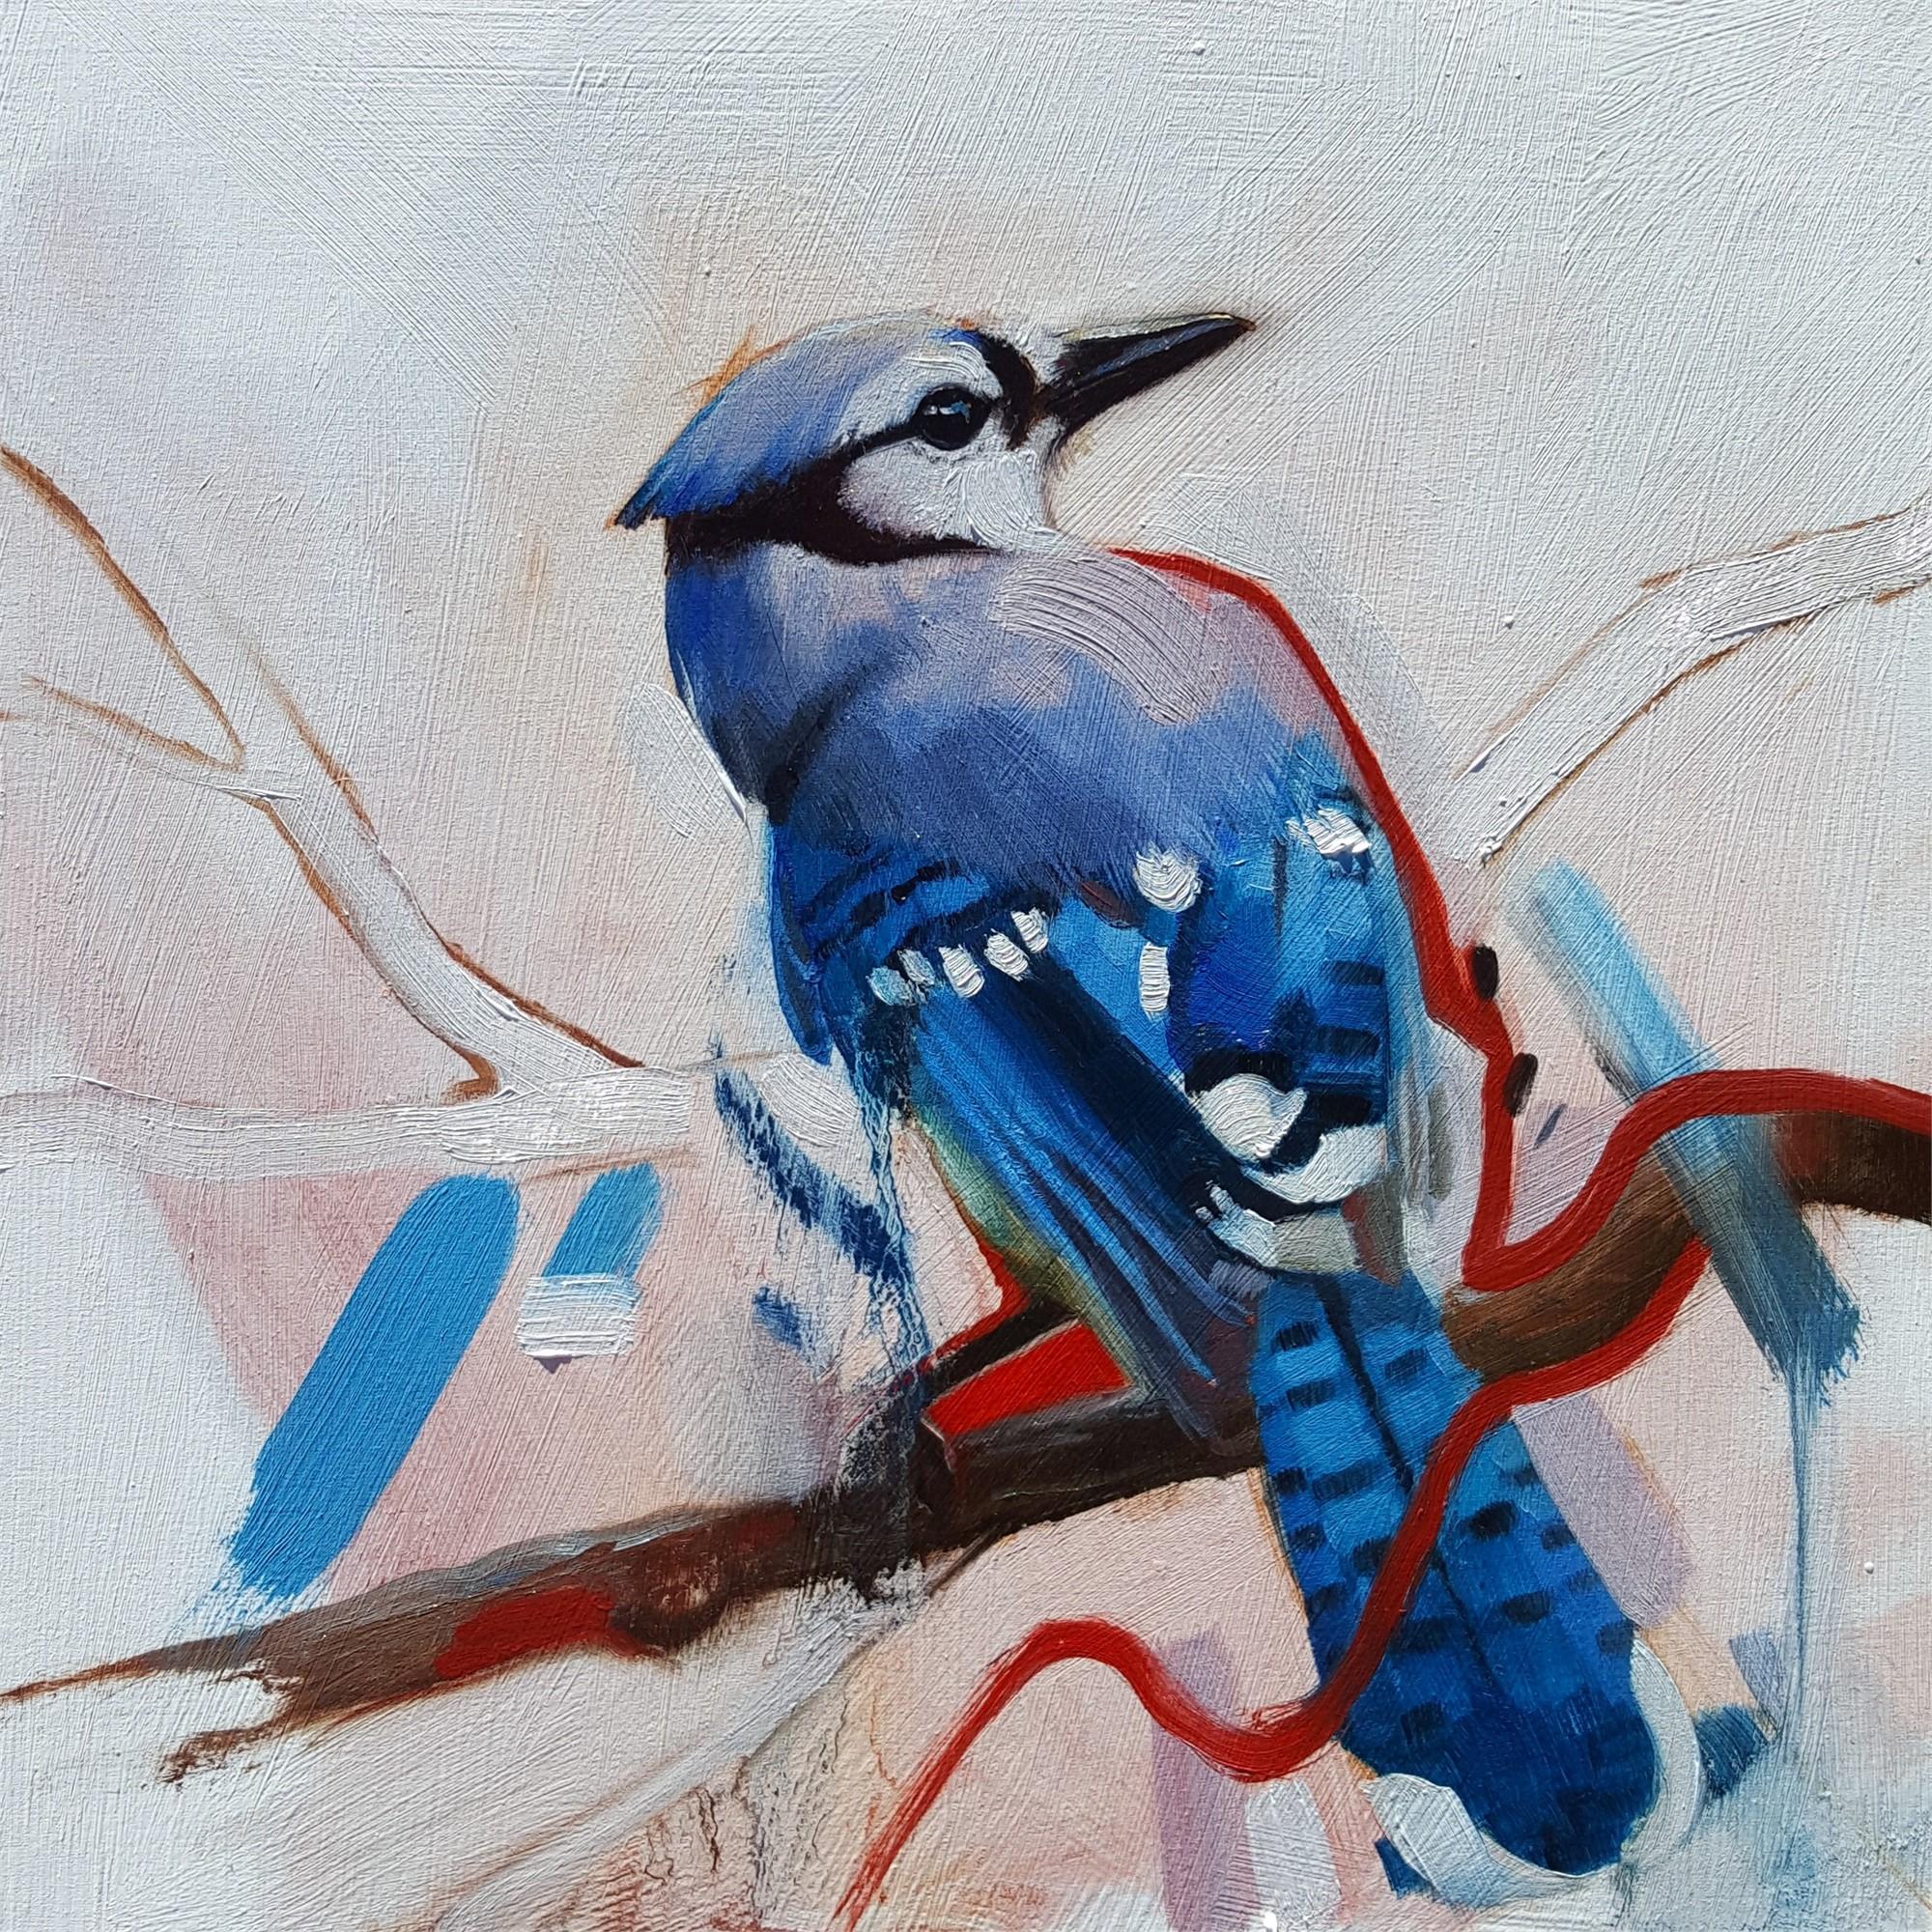 Blue Jay by Ryan Morse